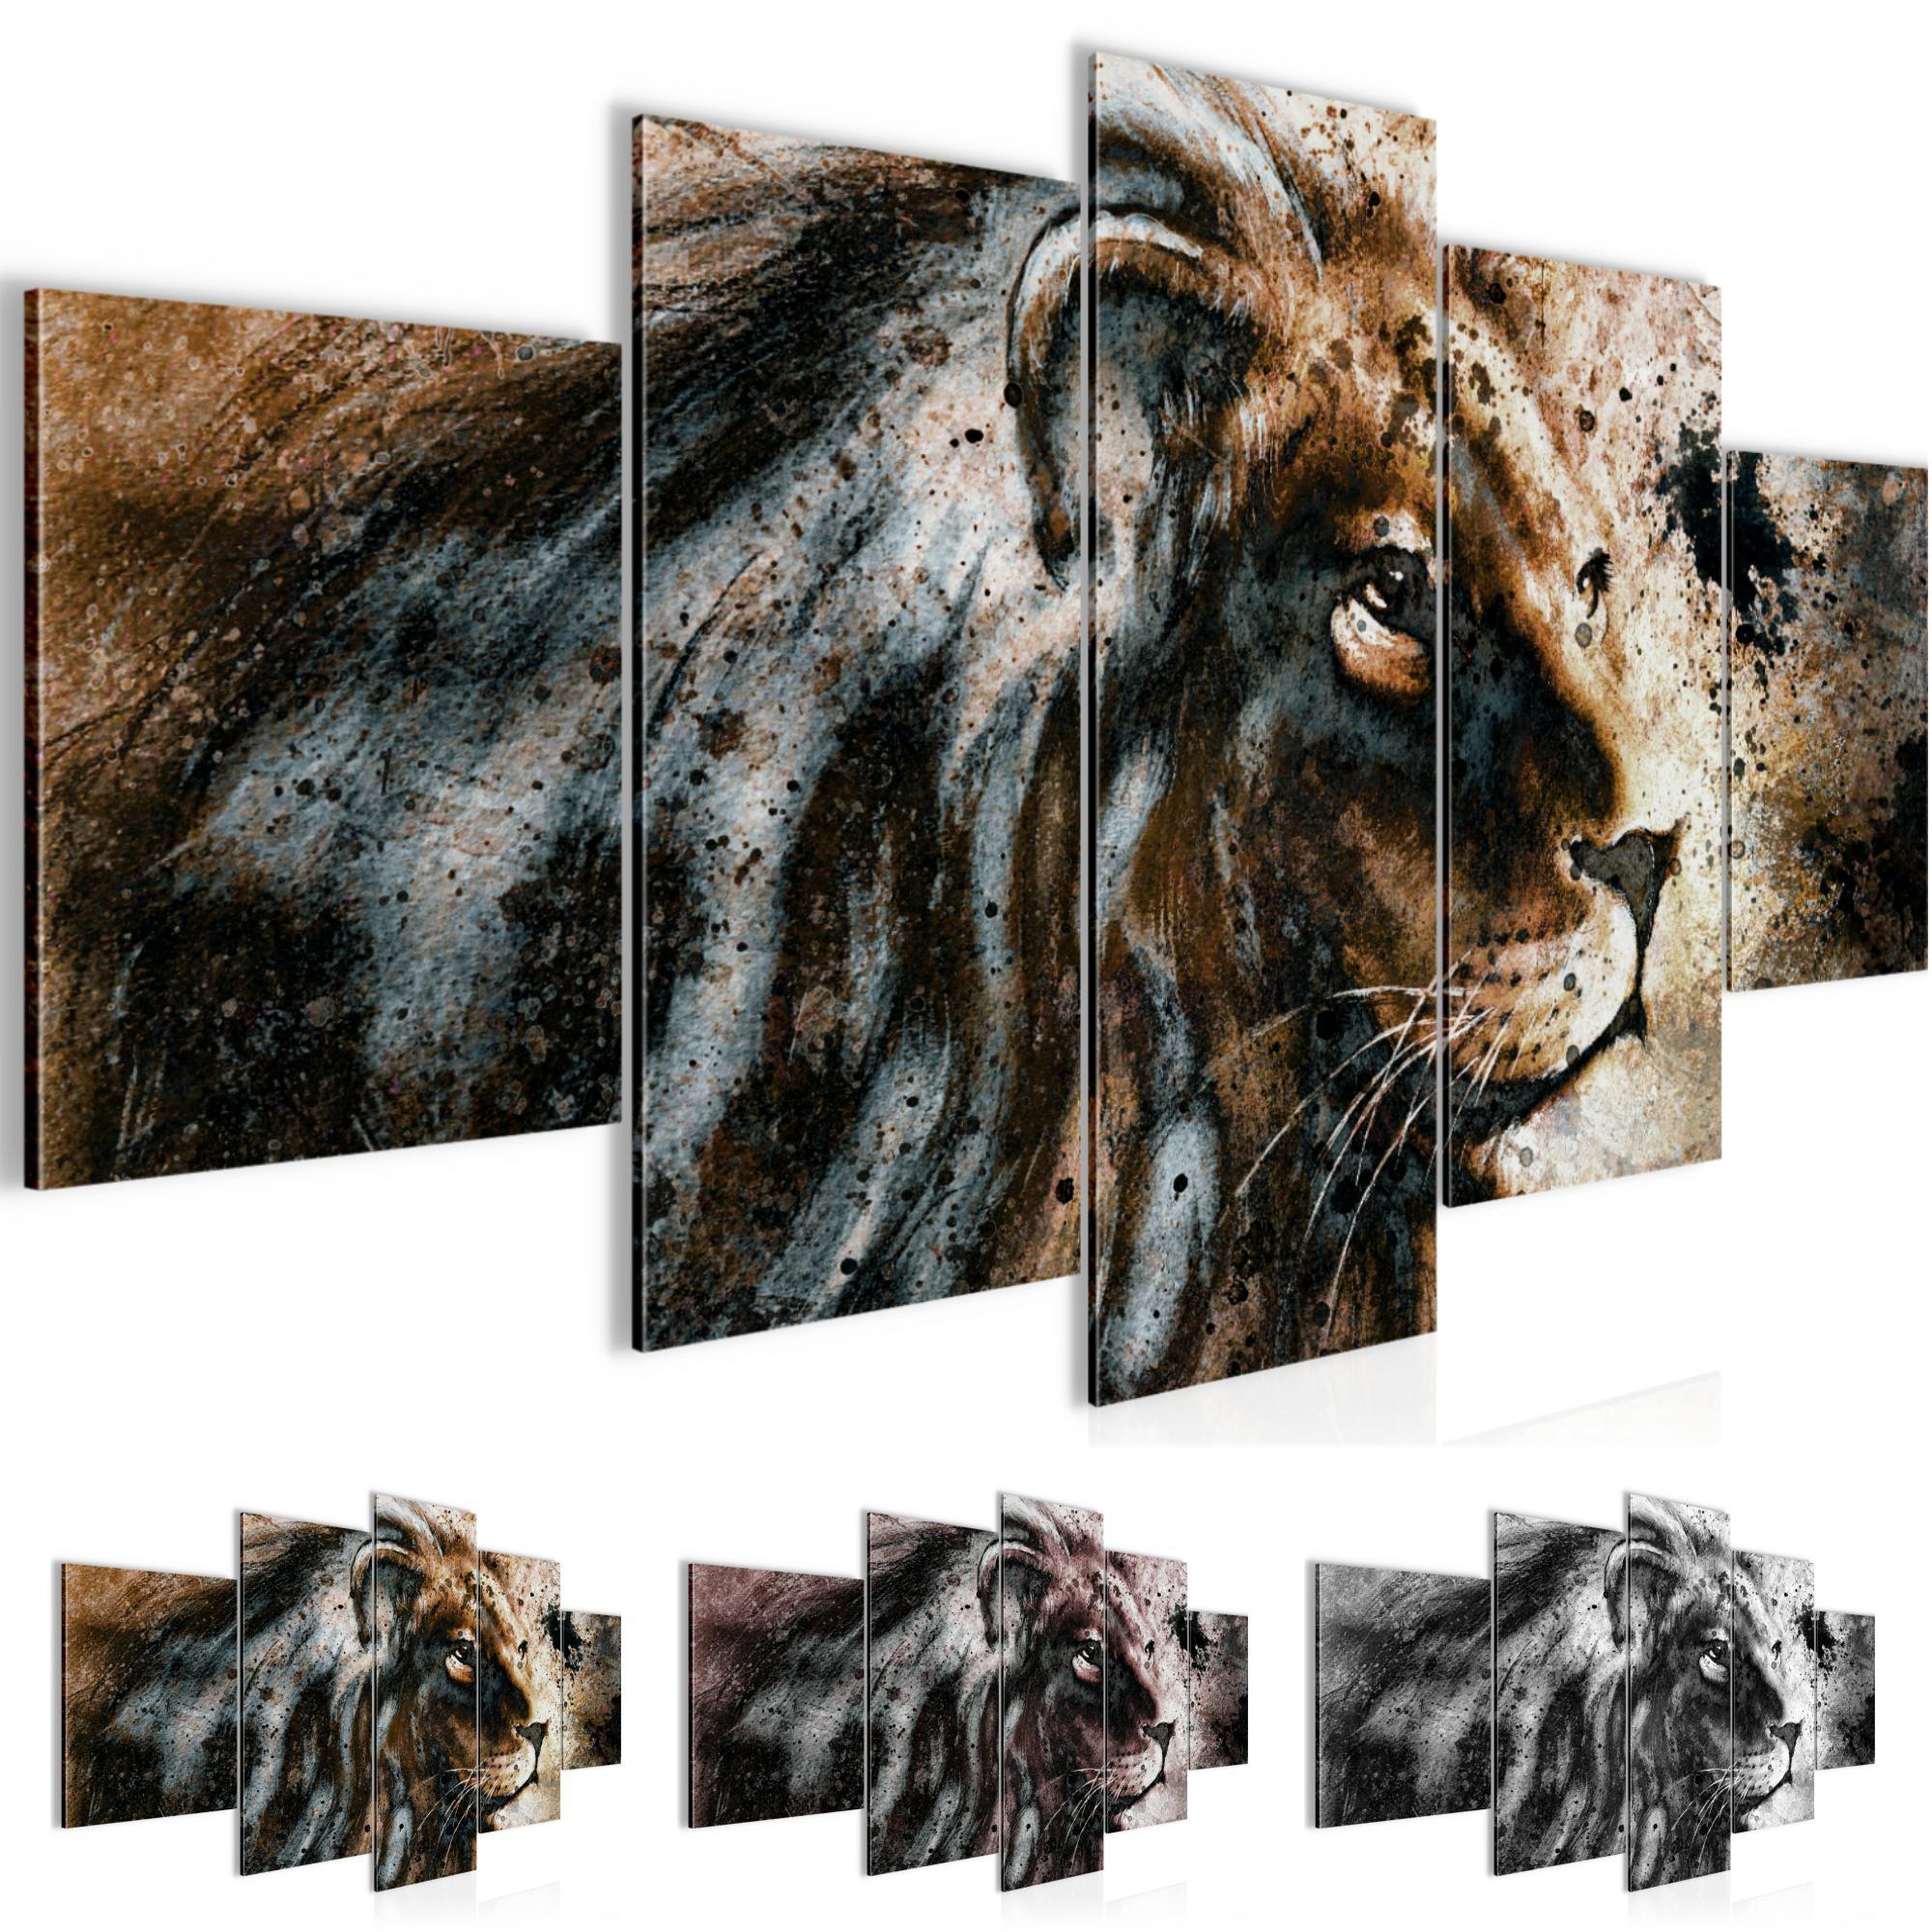 Afrika l we bild kunstdruck auf vlies leinwand xxl dekoration 00225p - Dekoration afrika ...